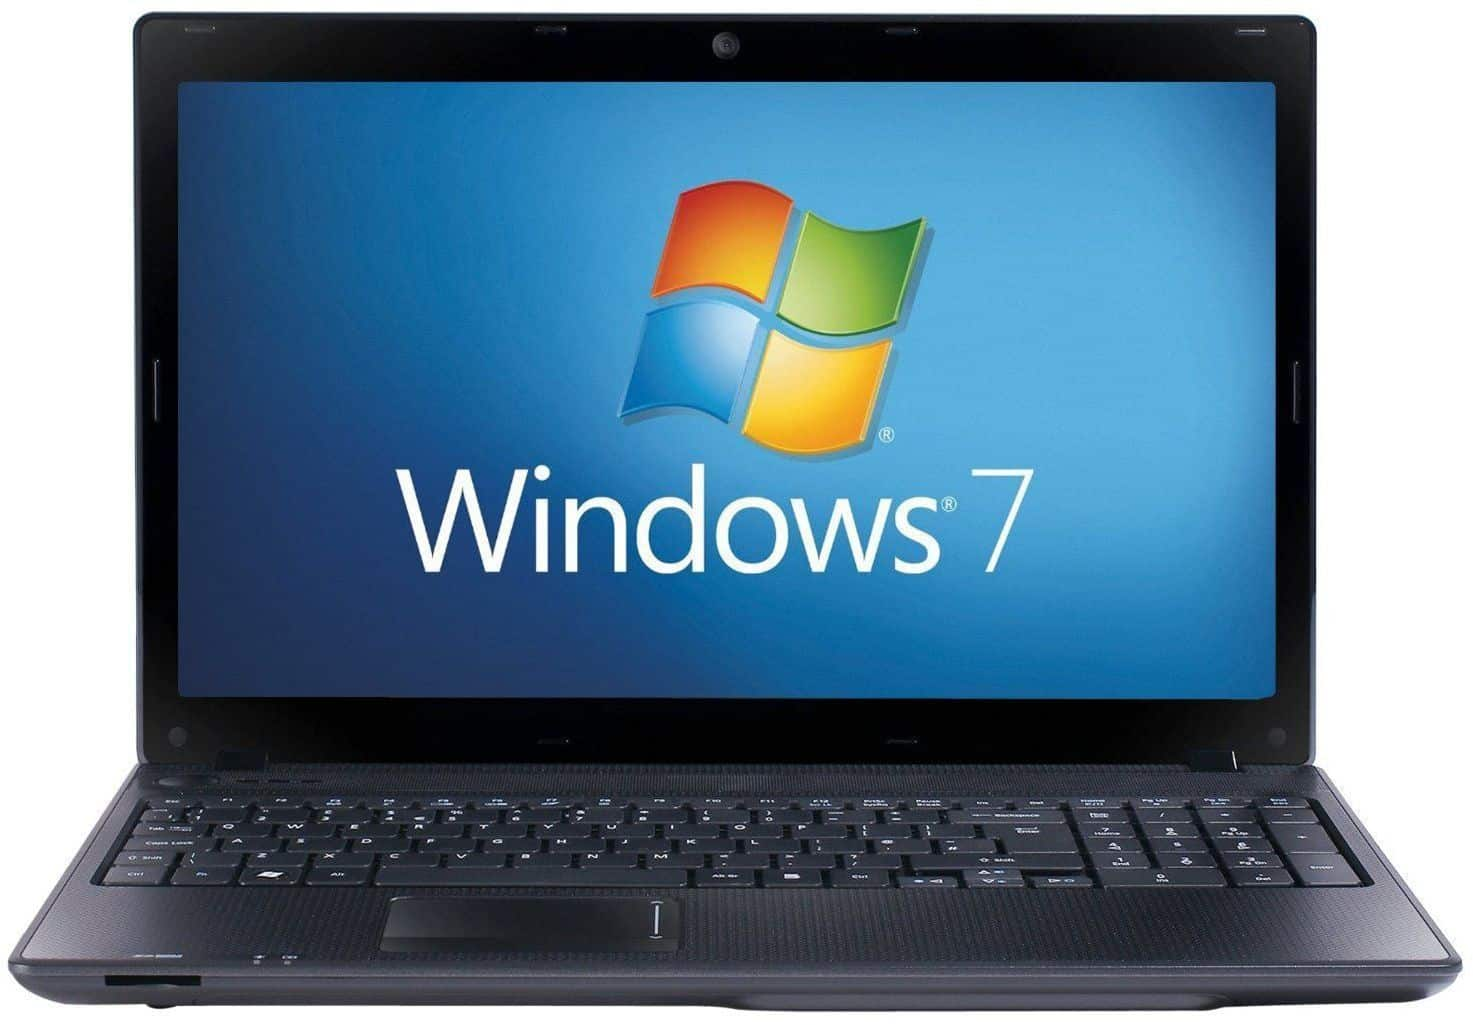 Windows 7 將不能裝在新電腦?!Intel 擬終止 UEFI 兼容傳統 BIOS